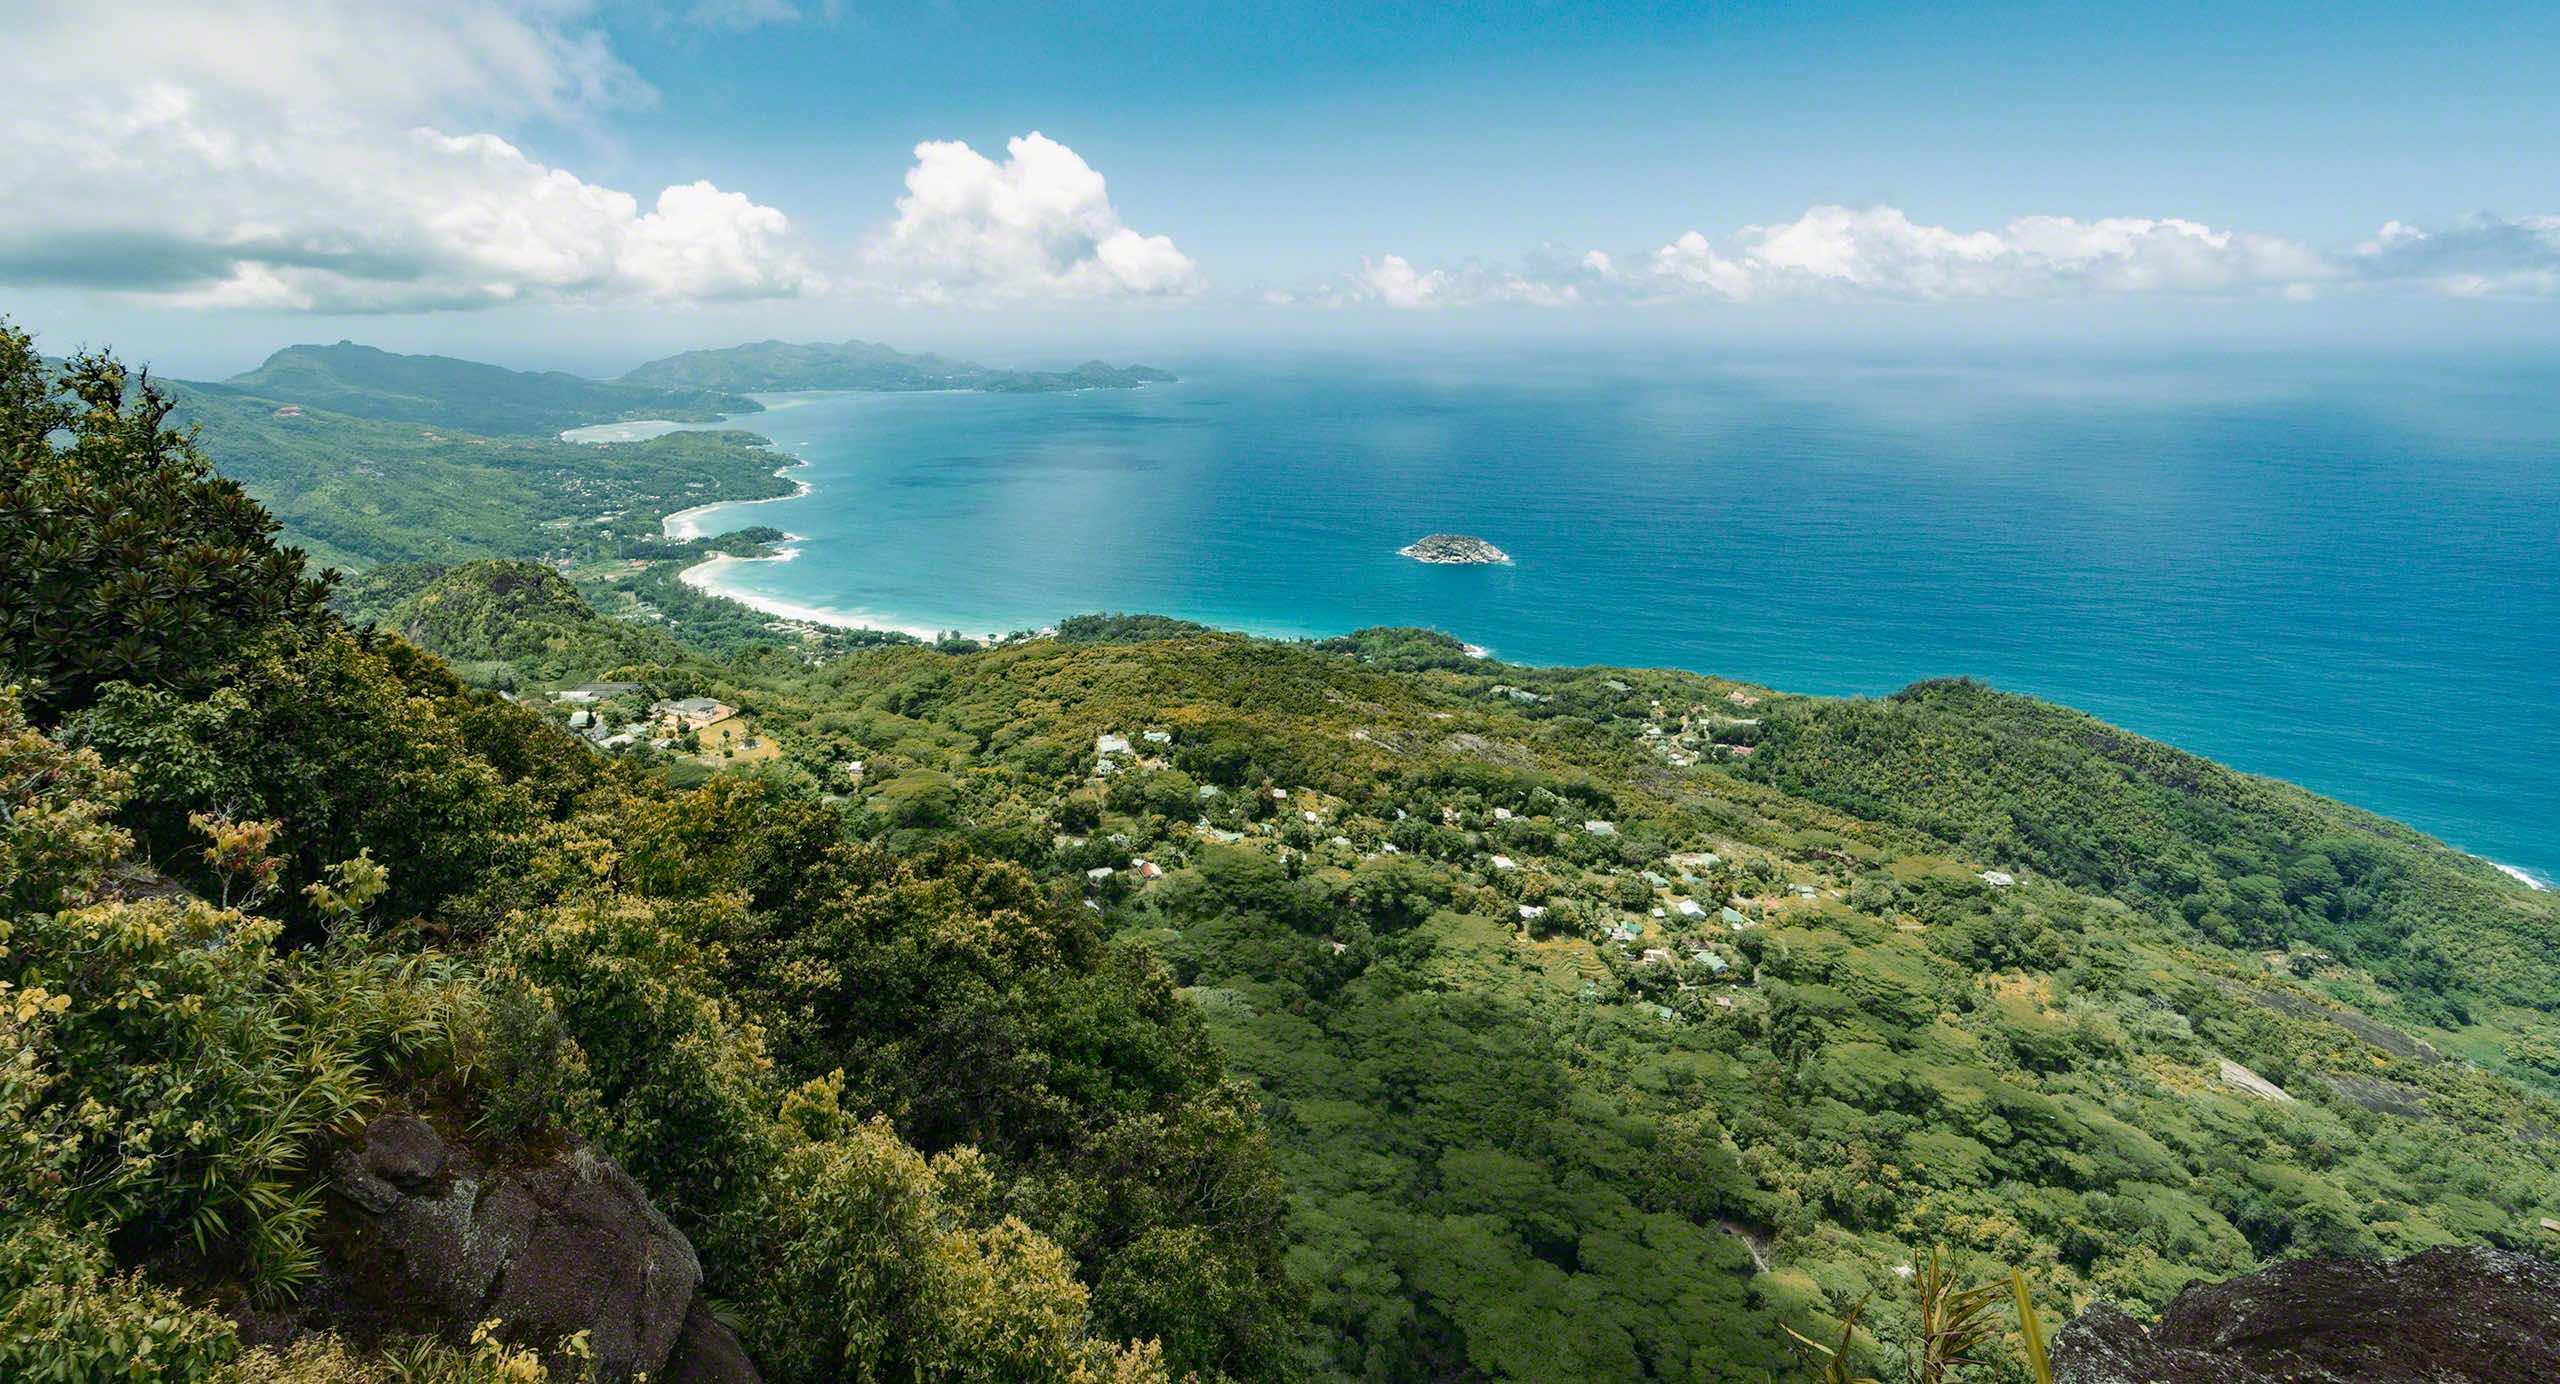 Seychellen Bergwanderung inklusive Seychellen Panoramabild am Morne Seychellois © Mirco Seyfert